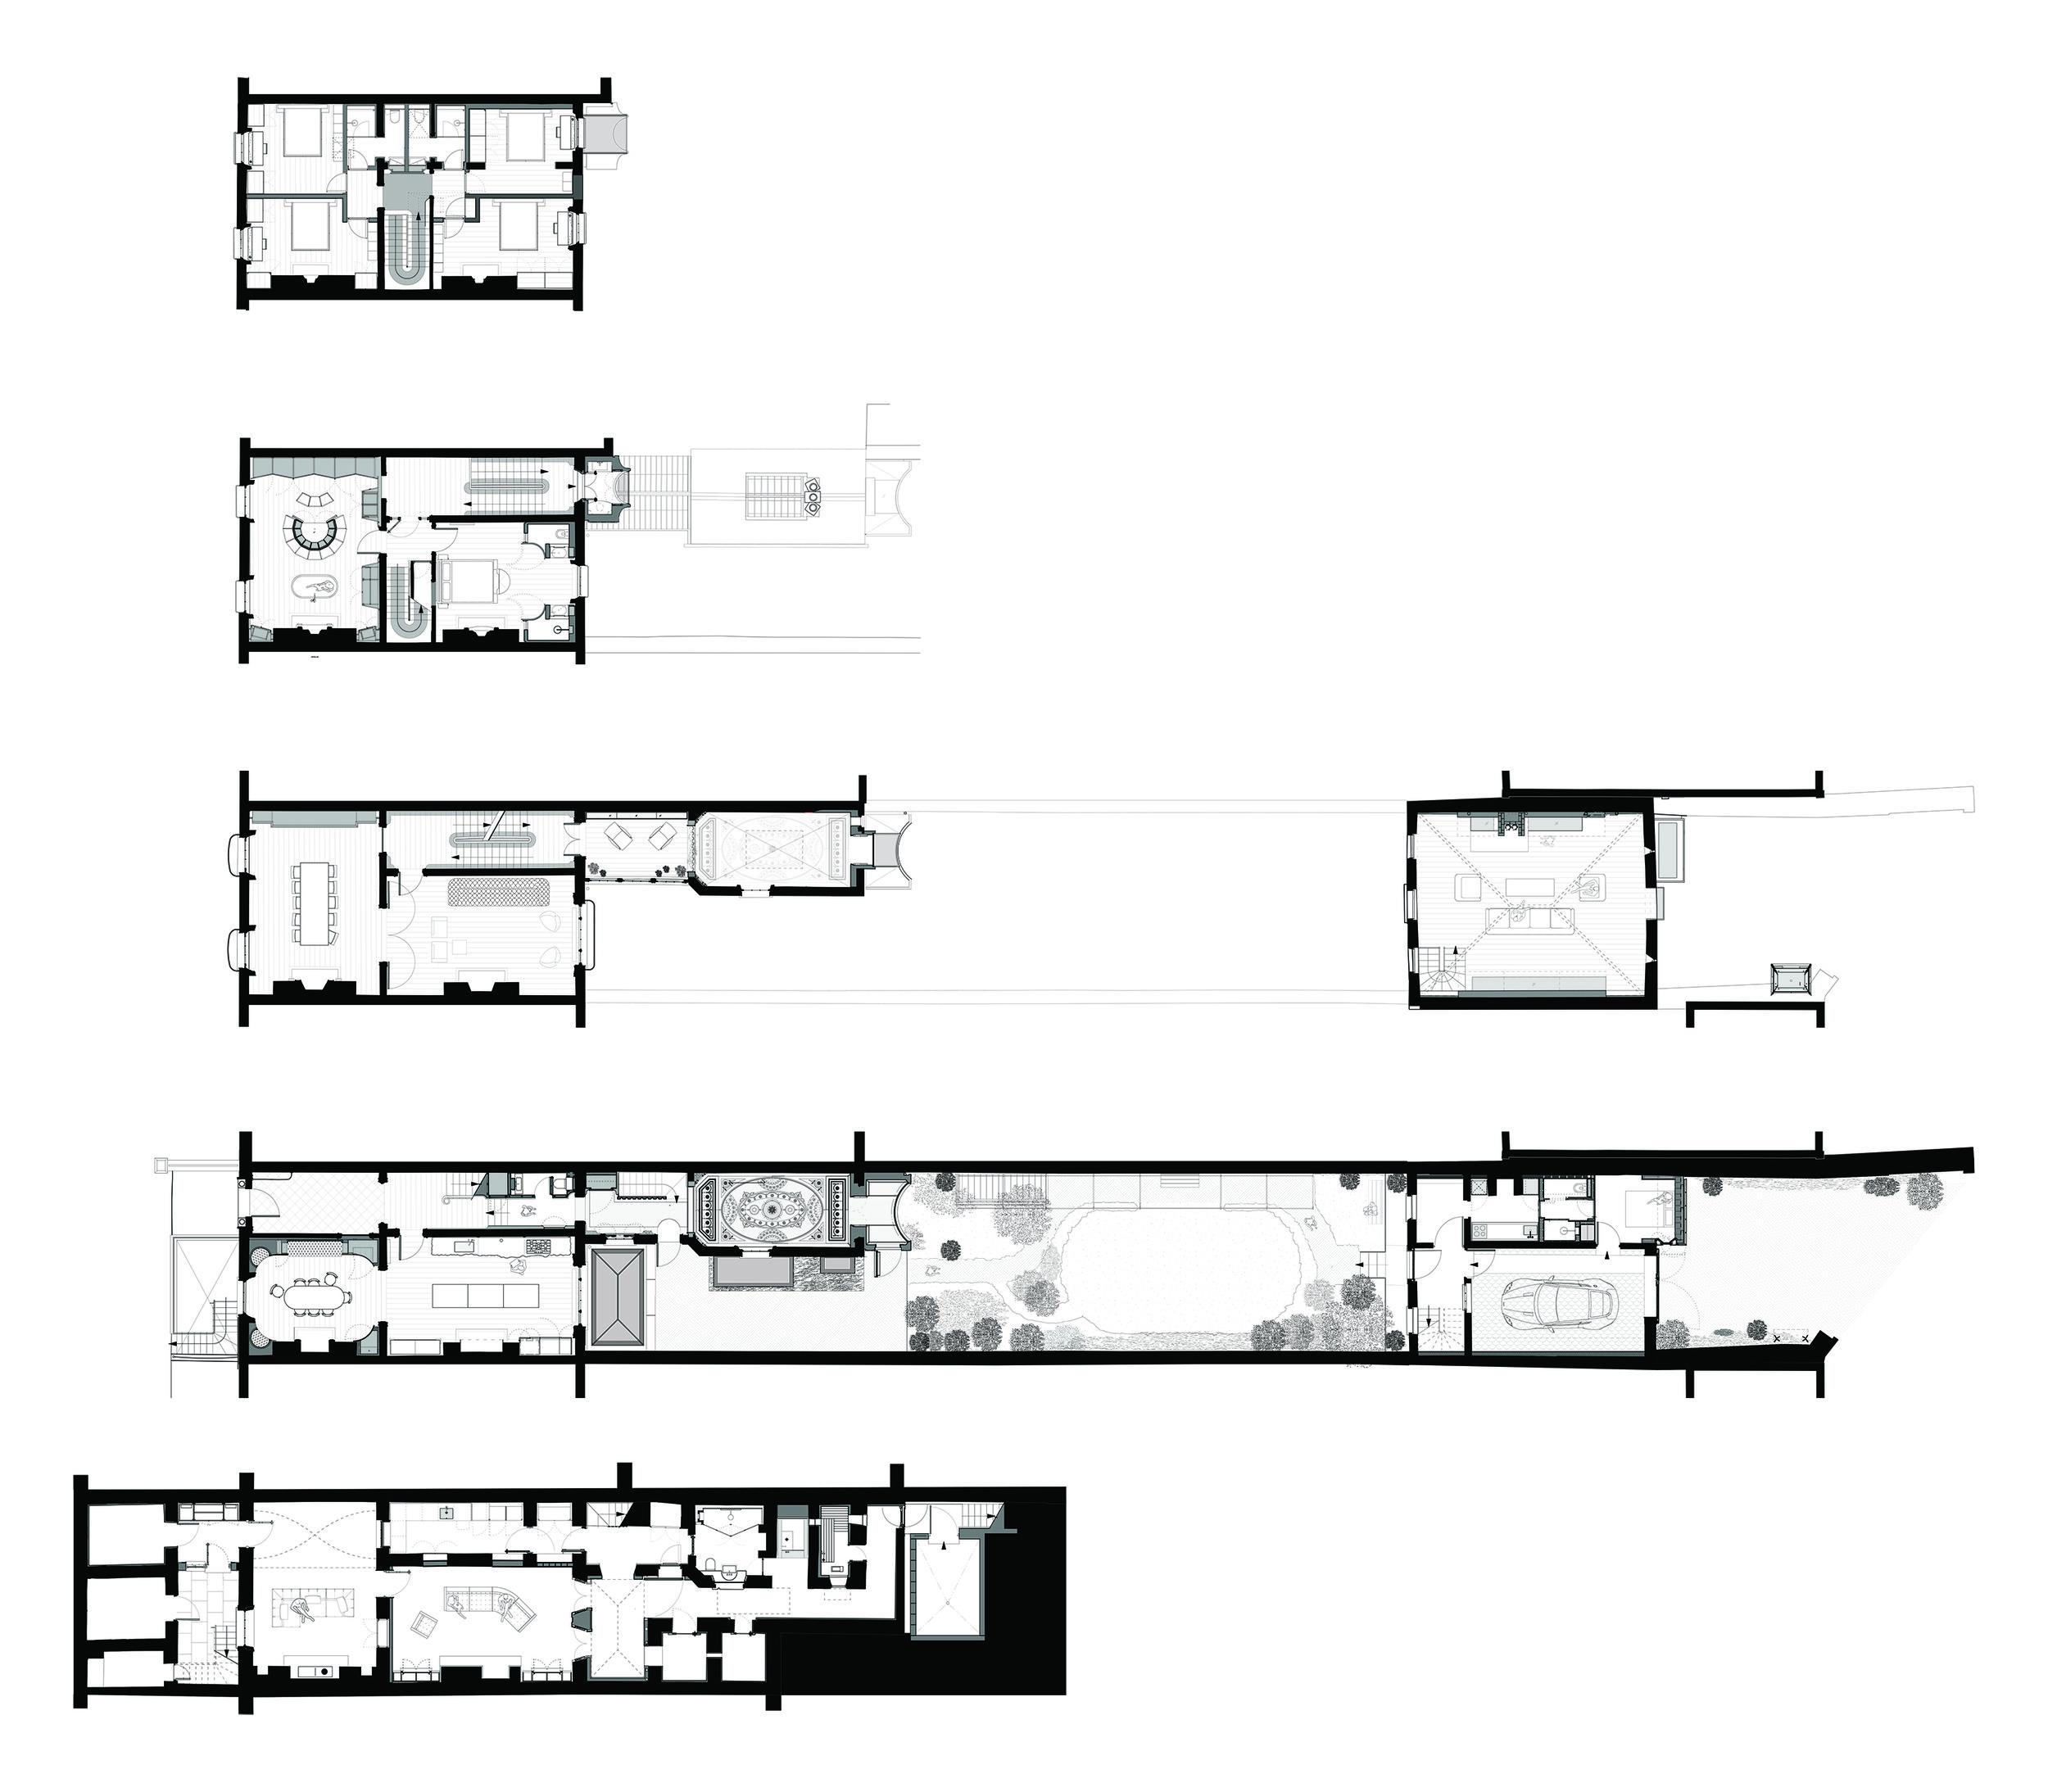 180521 Presentation Plans JM small.jpg